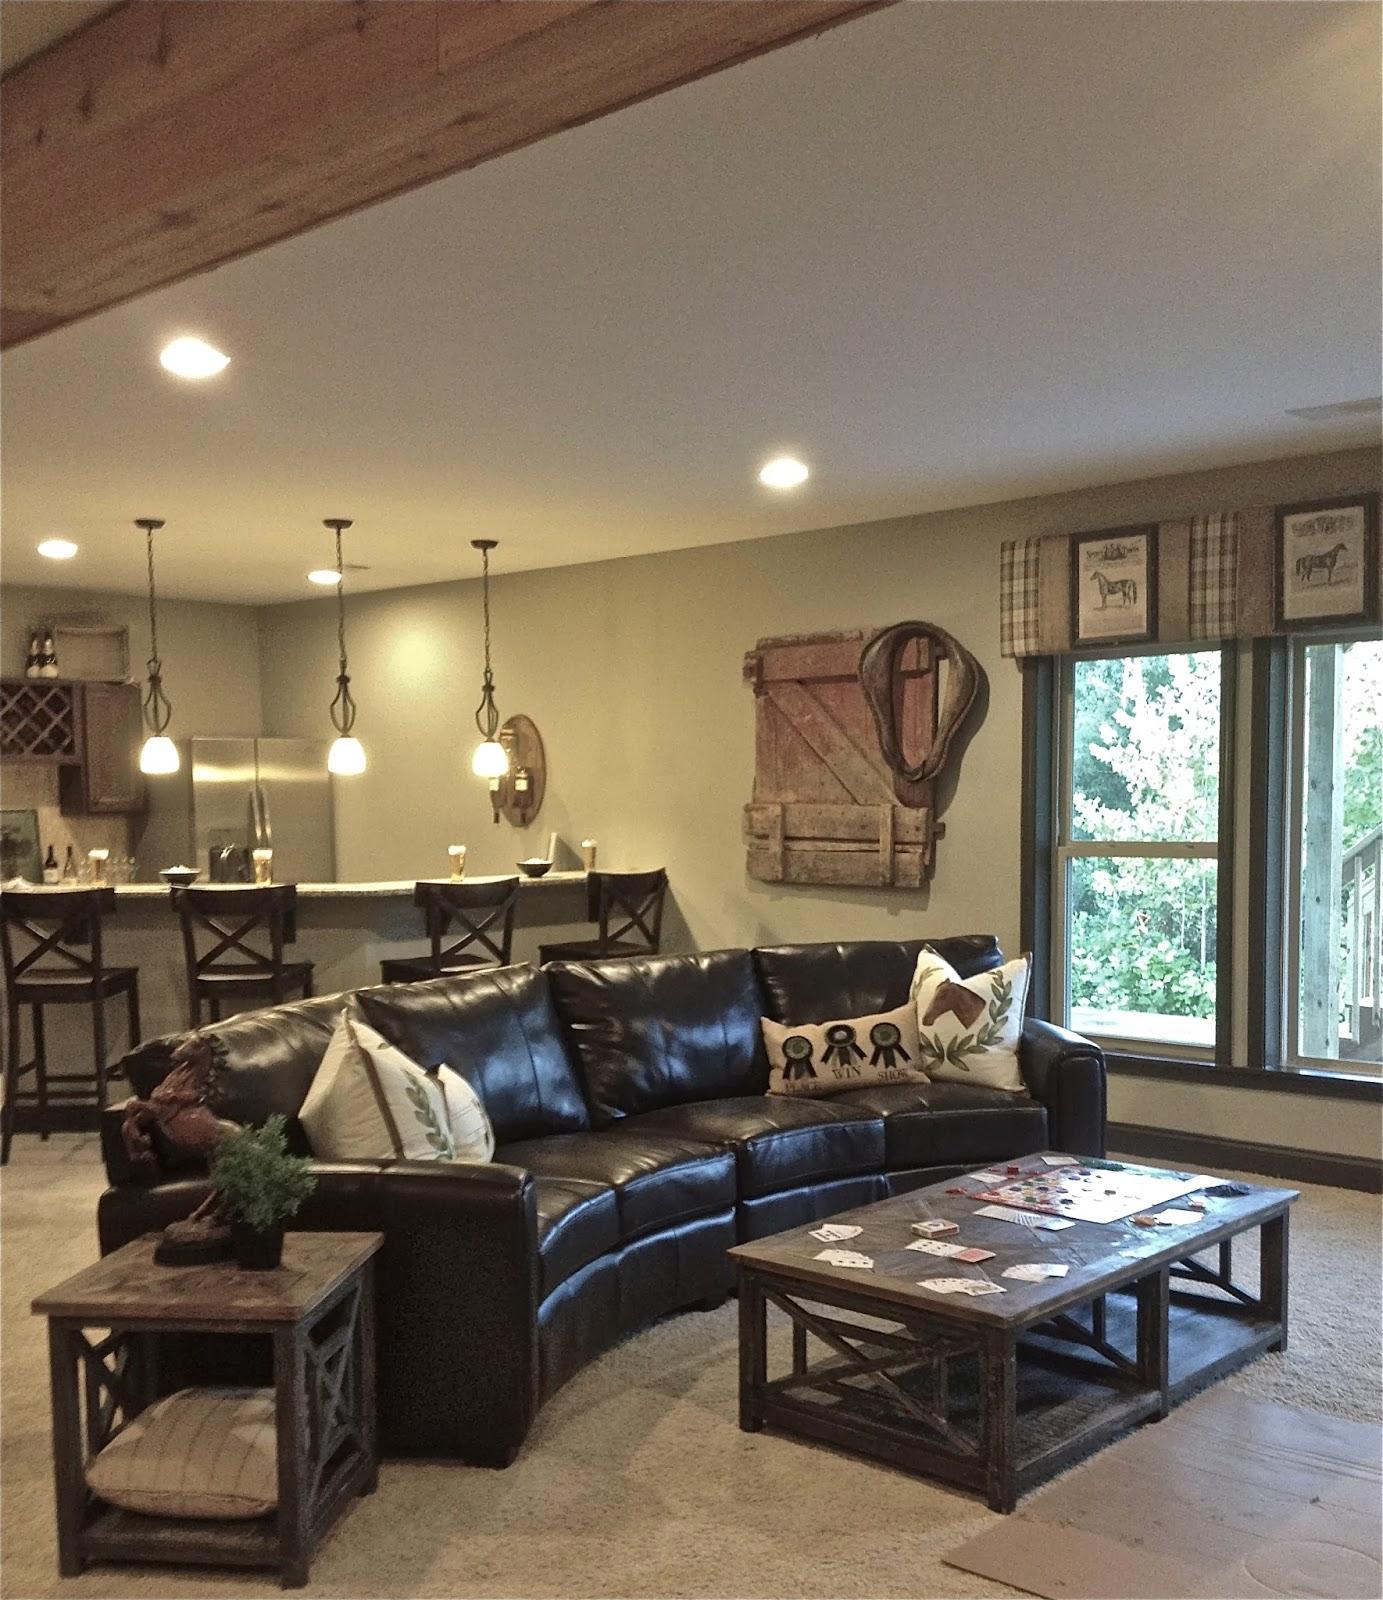 Curved Sofa Atlanta: Macara Blog: The Keller Home